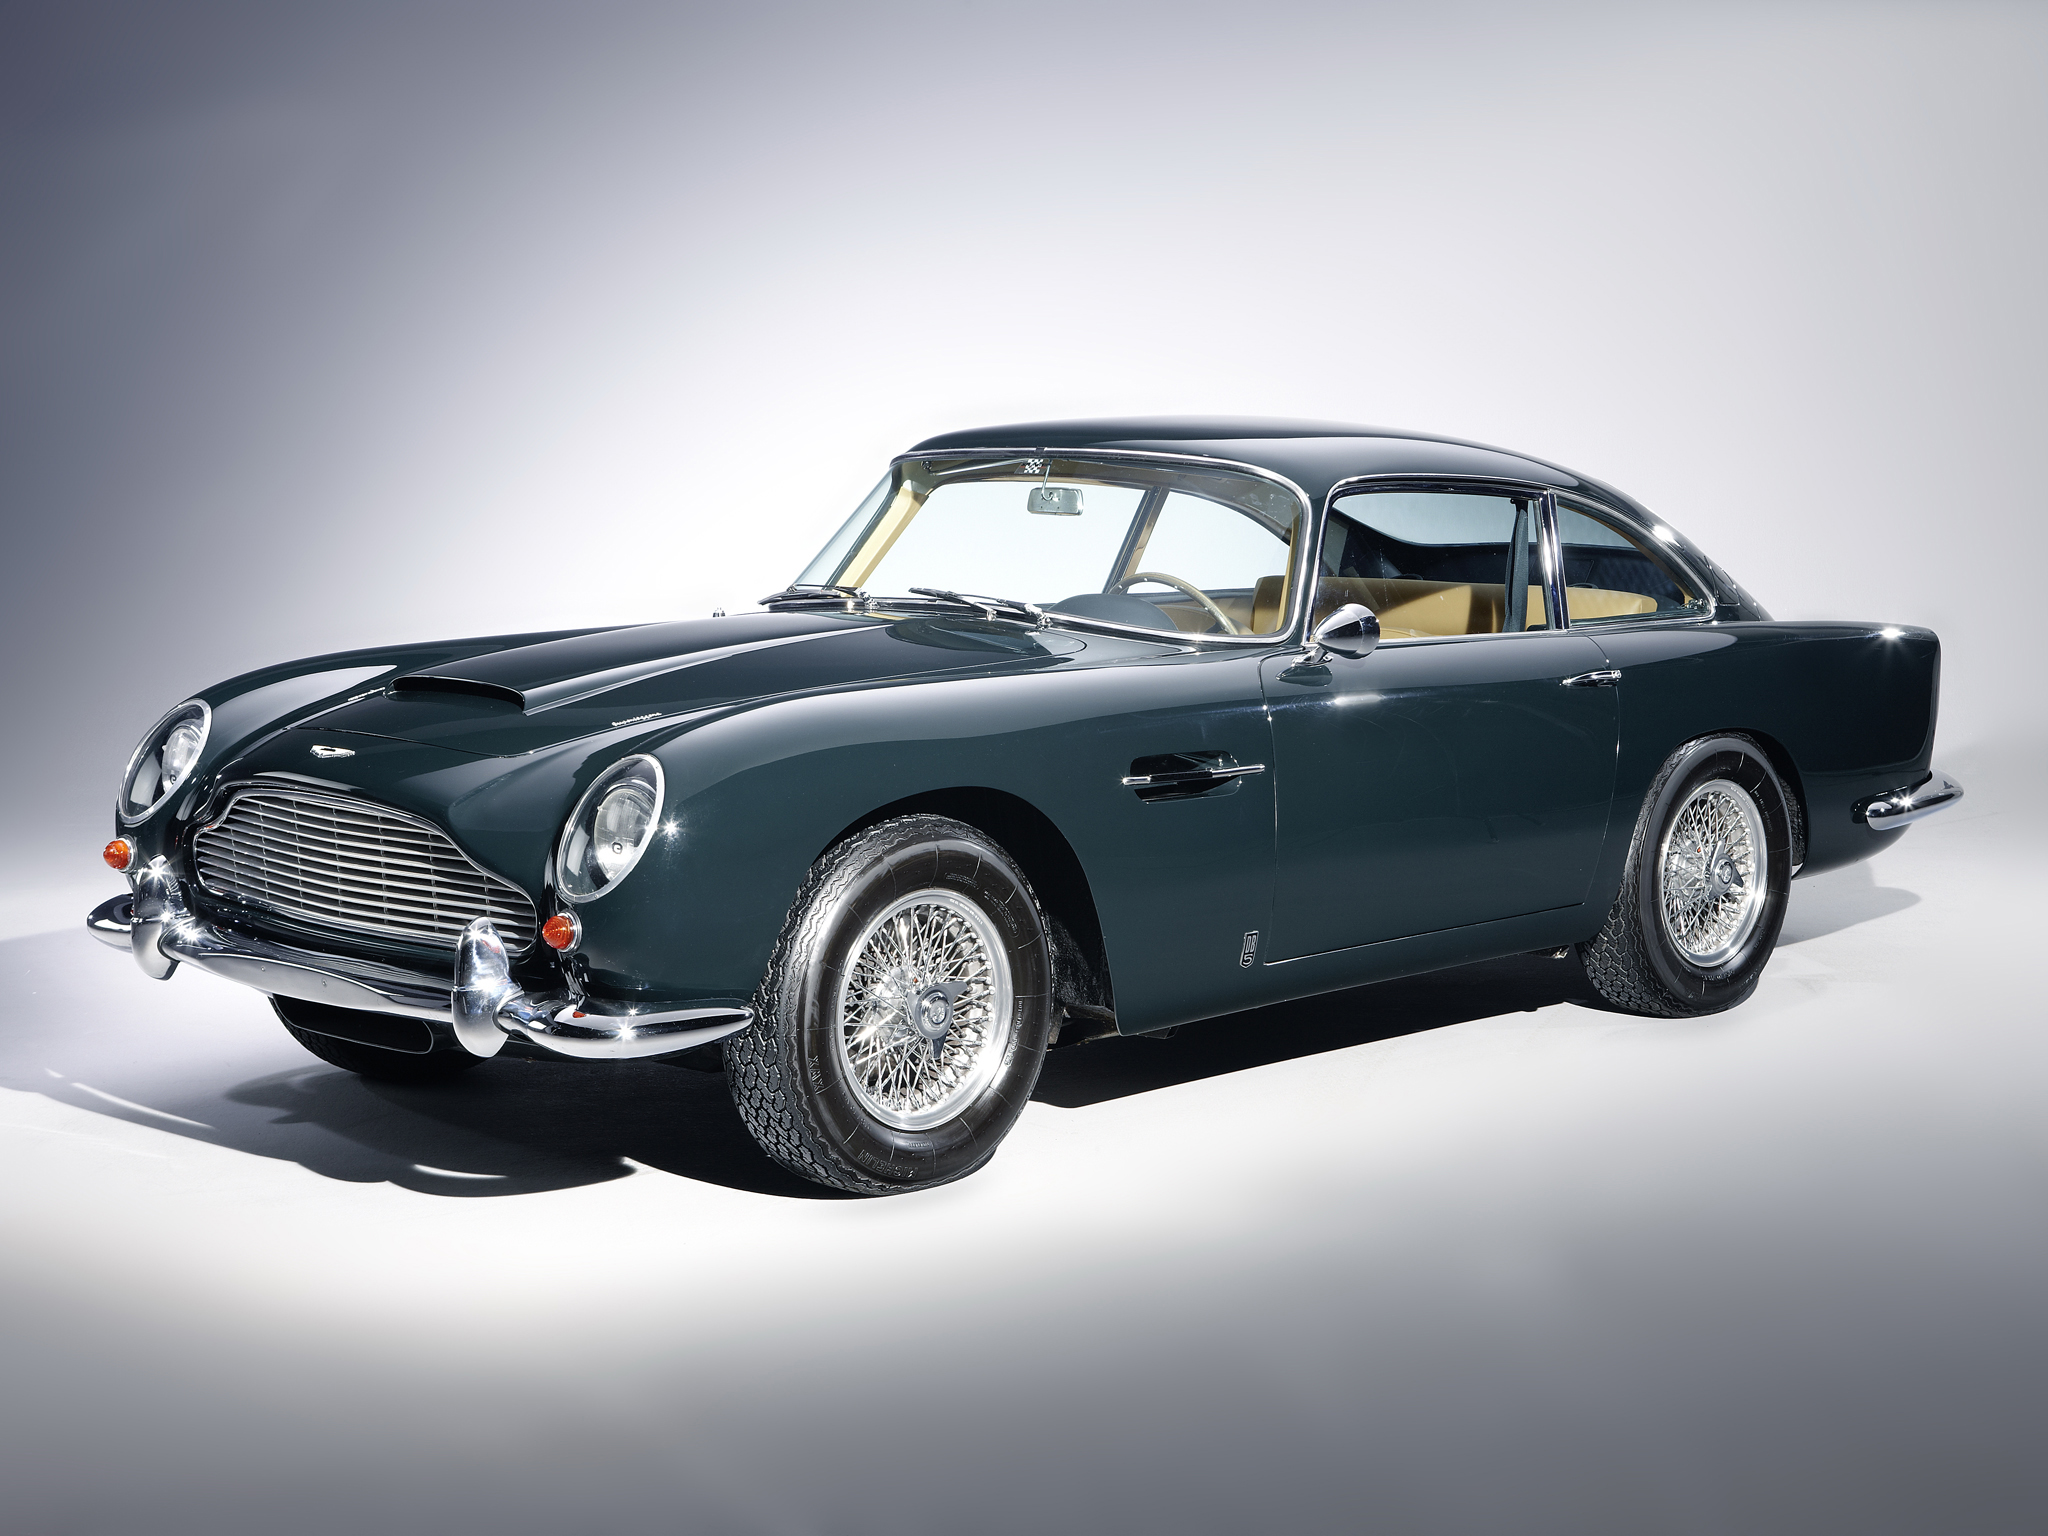 Aston Martin Db5 Vintage  Hd Desktop Wallpapers  4k Hd